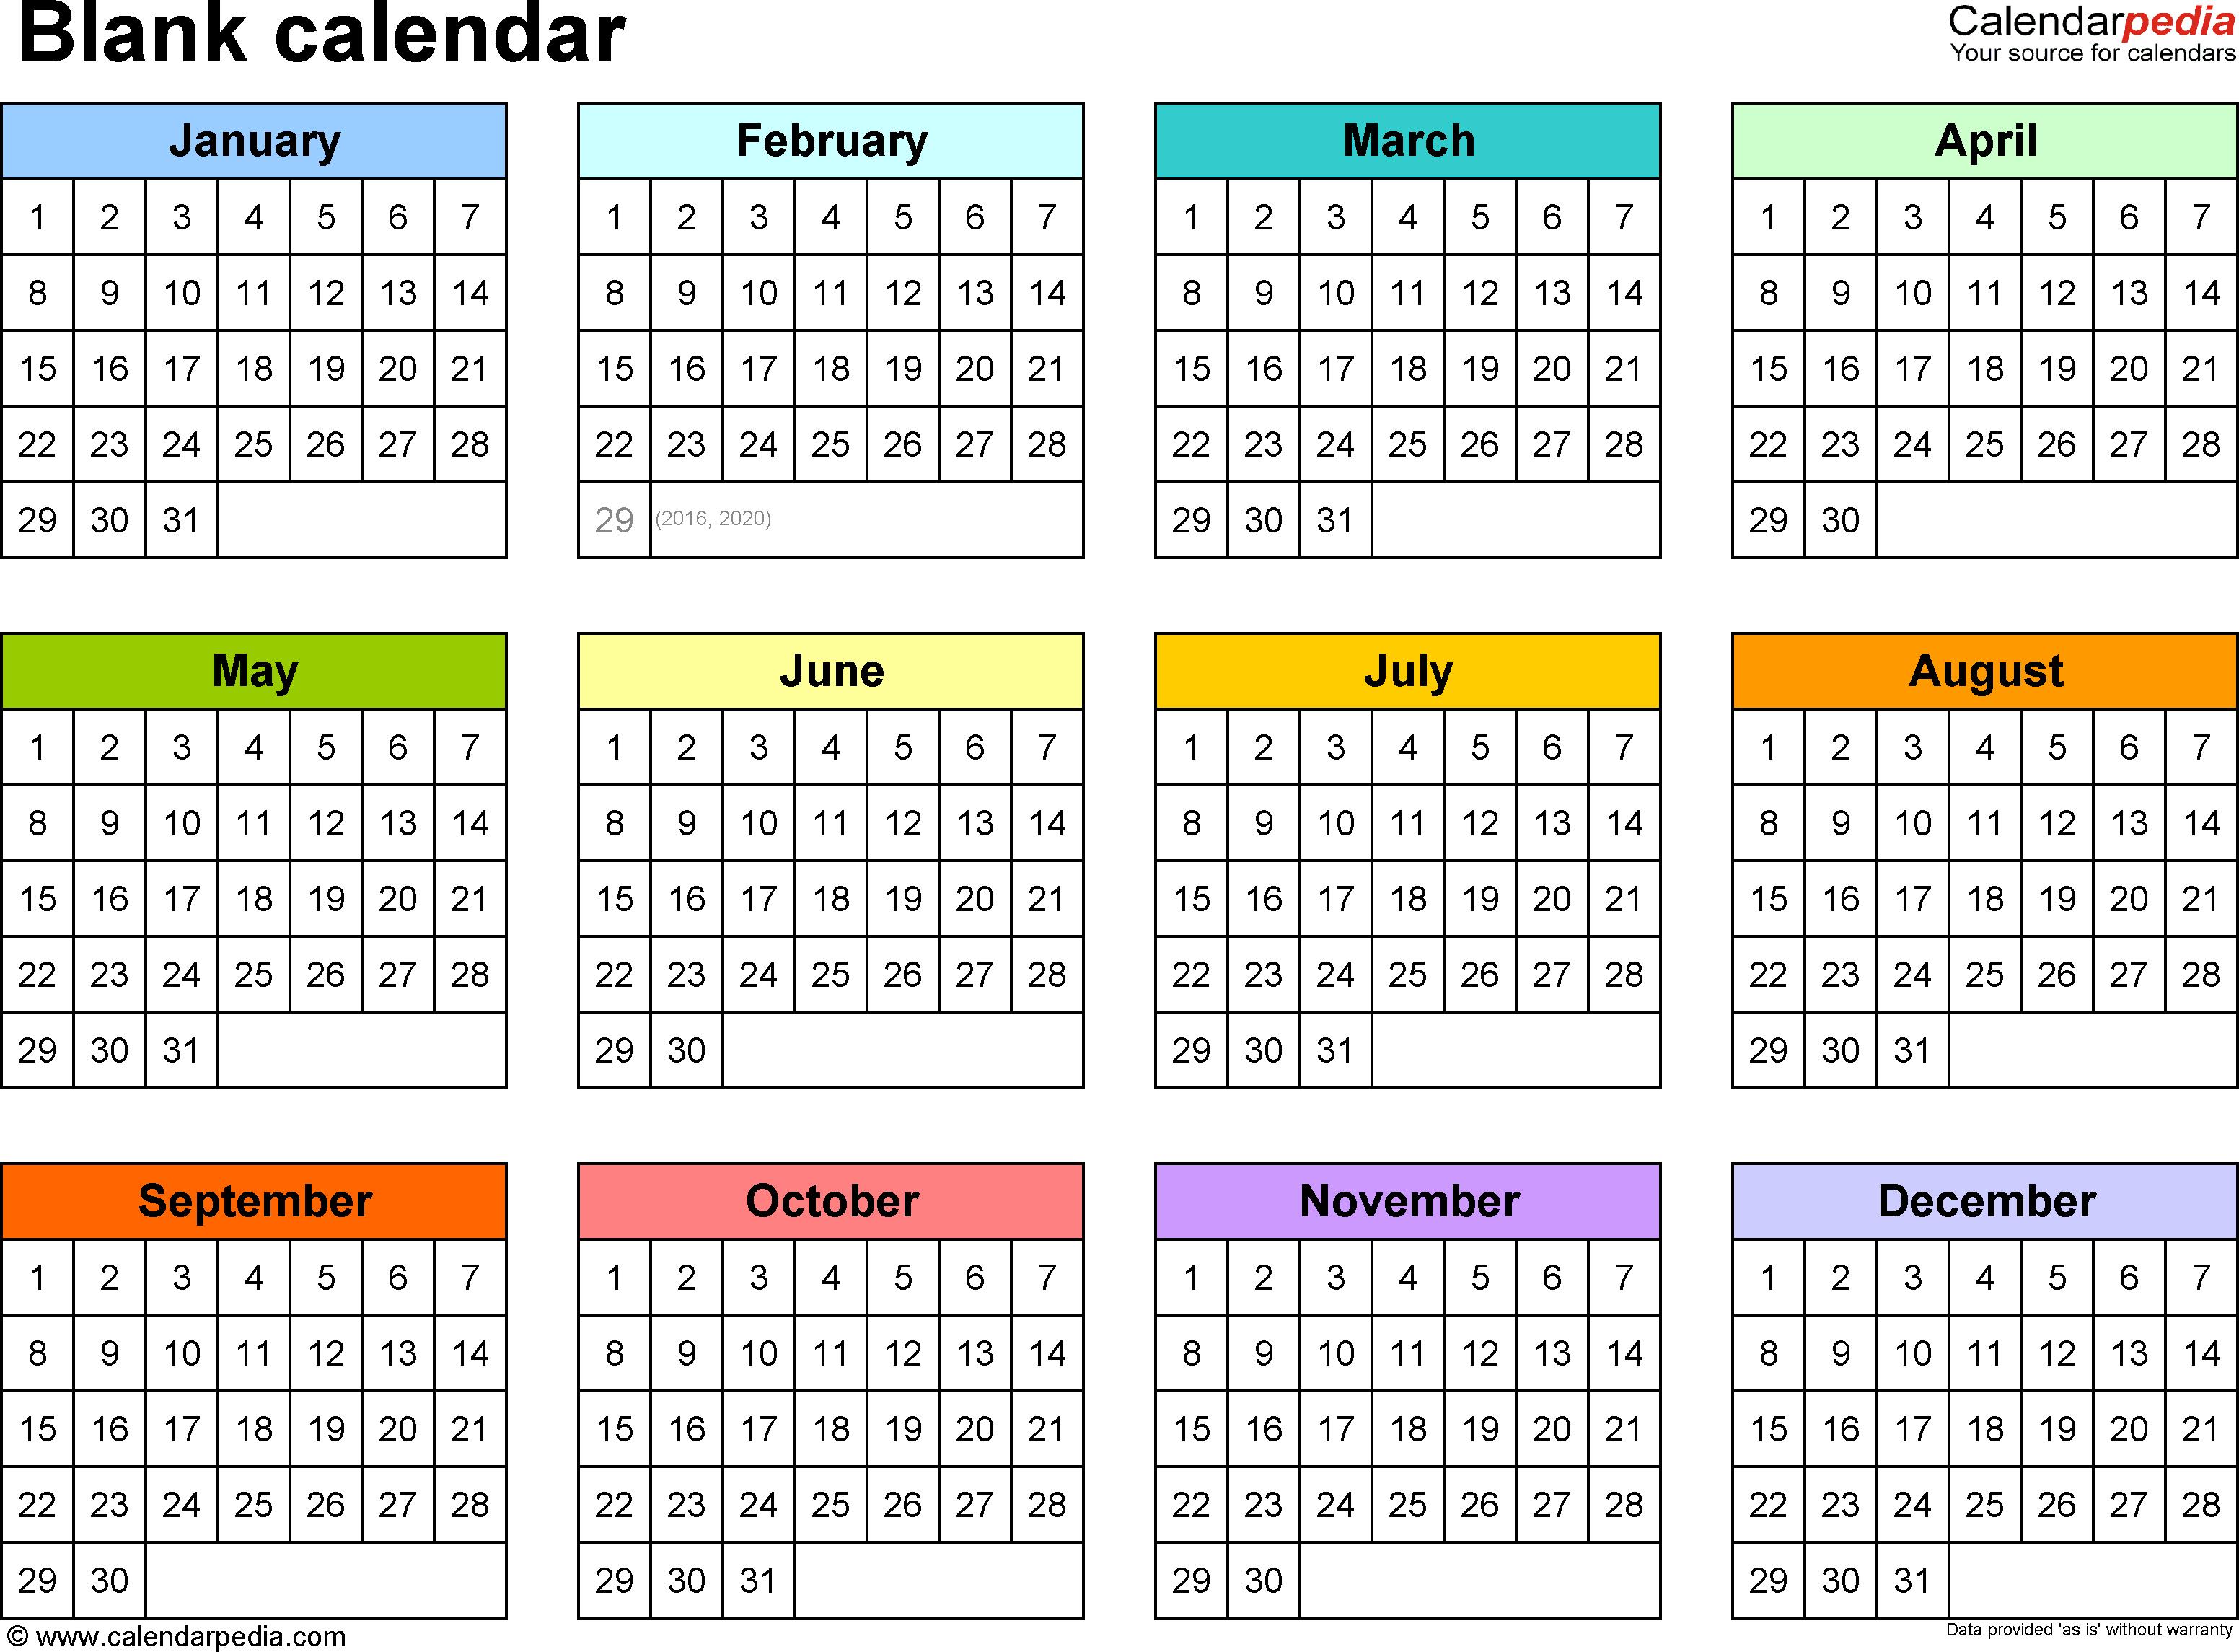 Blank Calendar - 9 Free Printable Microsoft Word Templates pertaining to Free Printable Calendar Templates 8 X 10